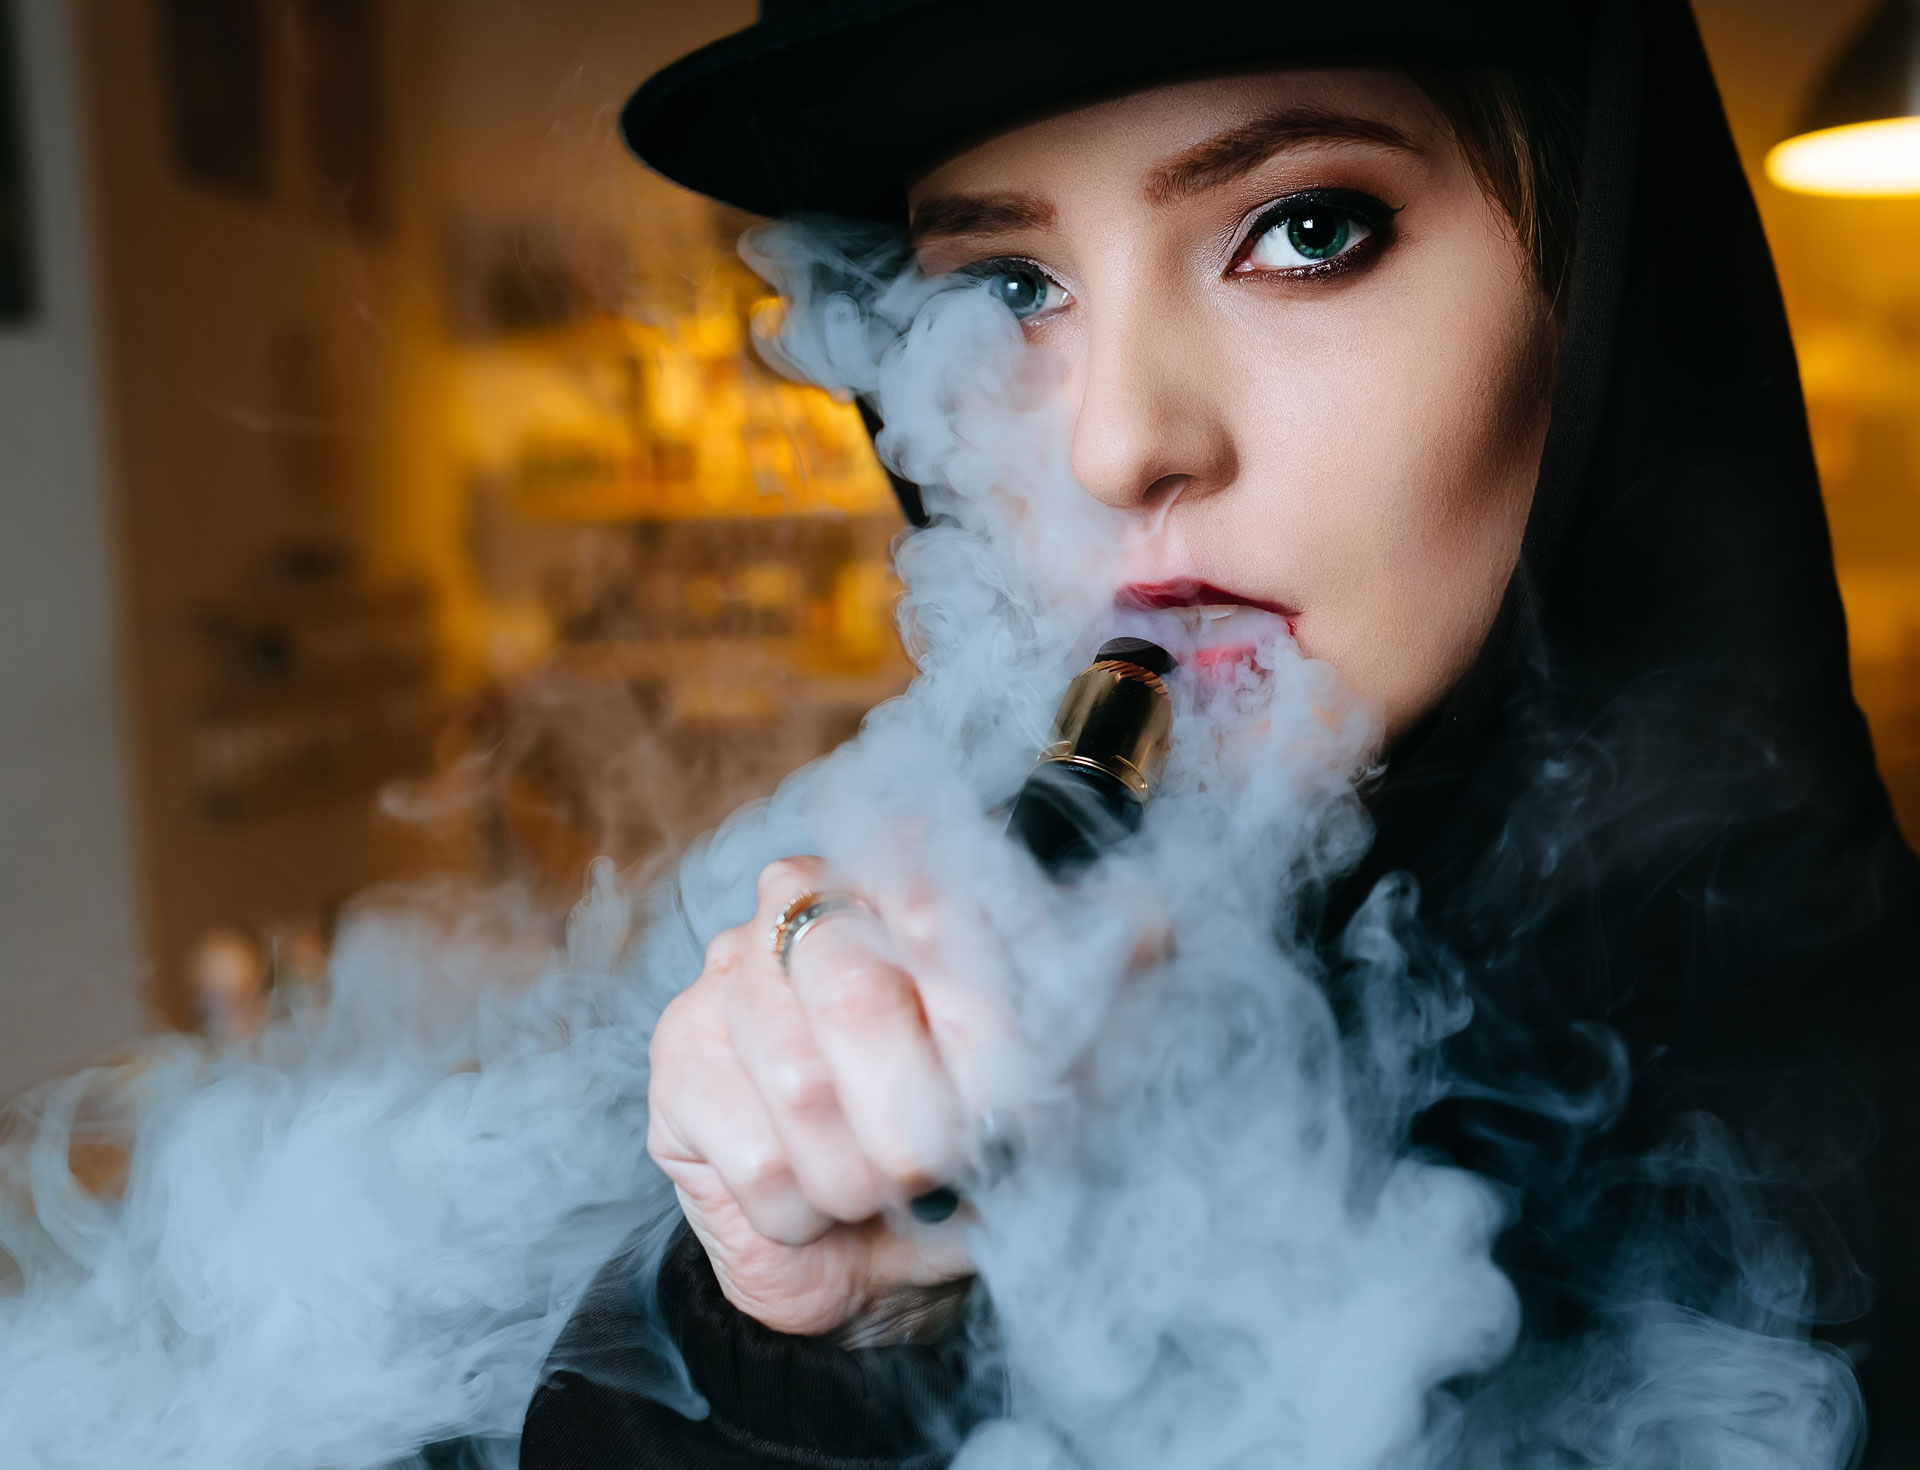 Taking e-cigarettes off the market won't prevent associated illnesses